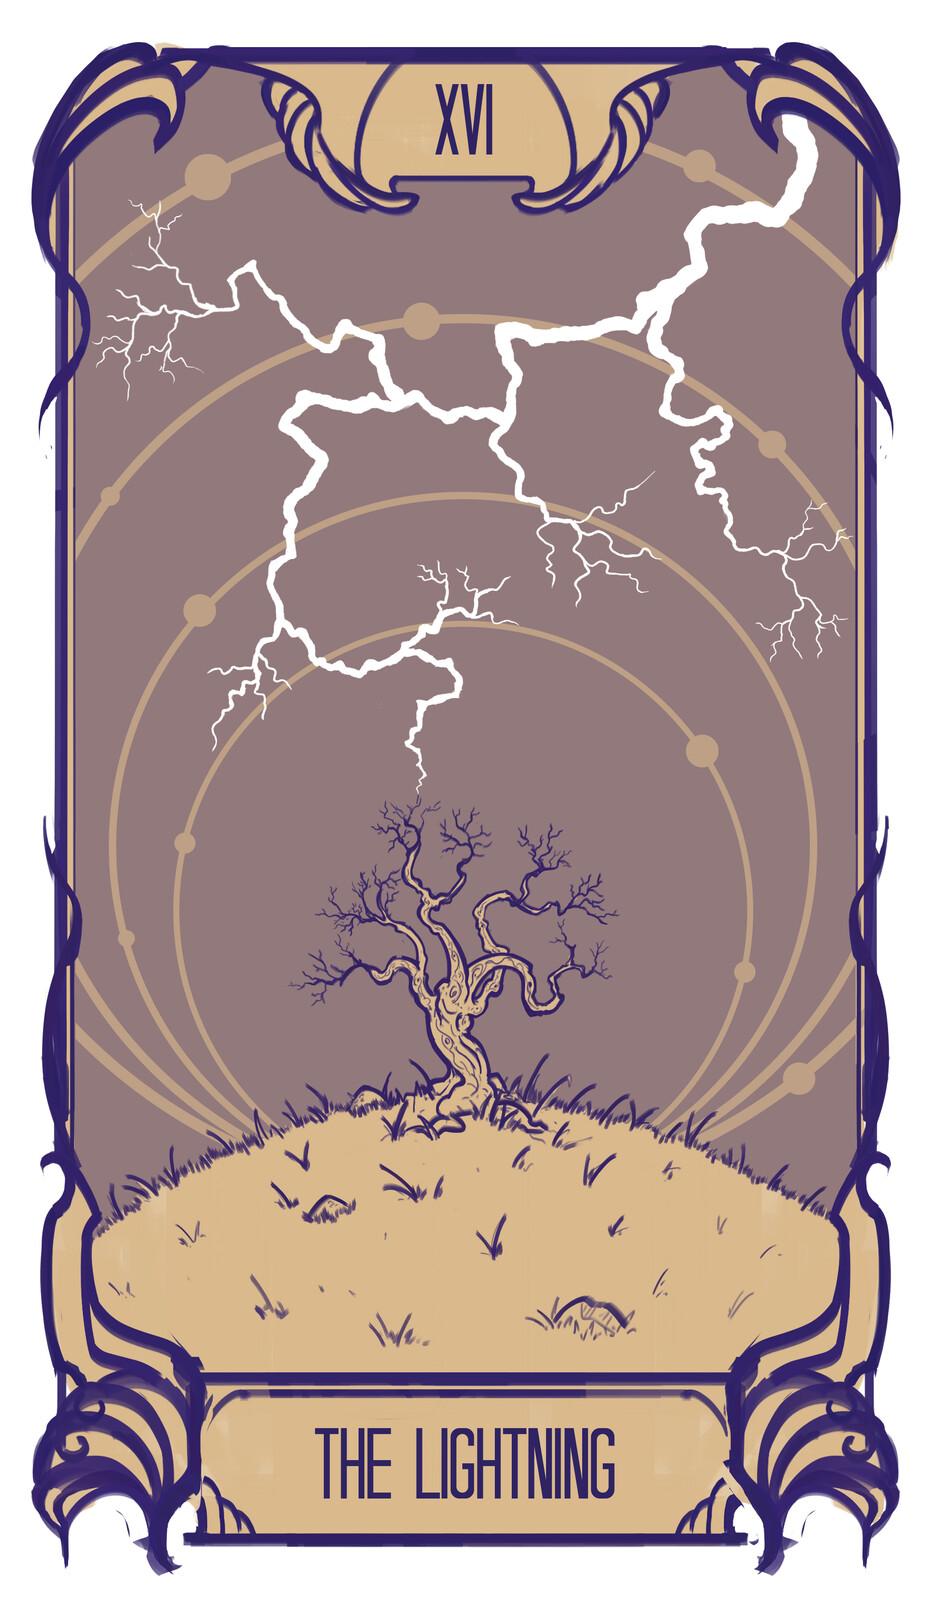 16. The Lightning